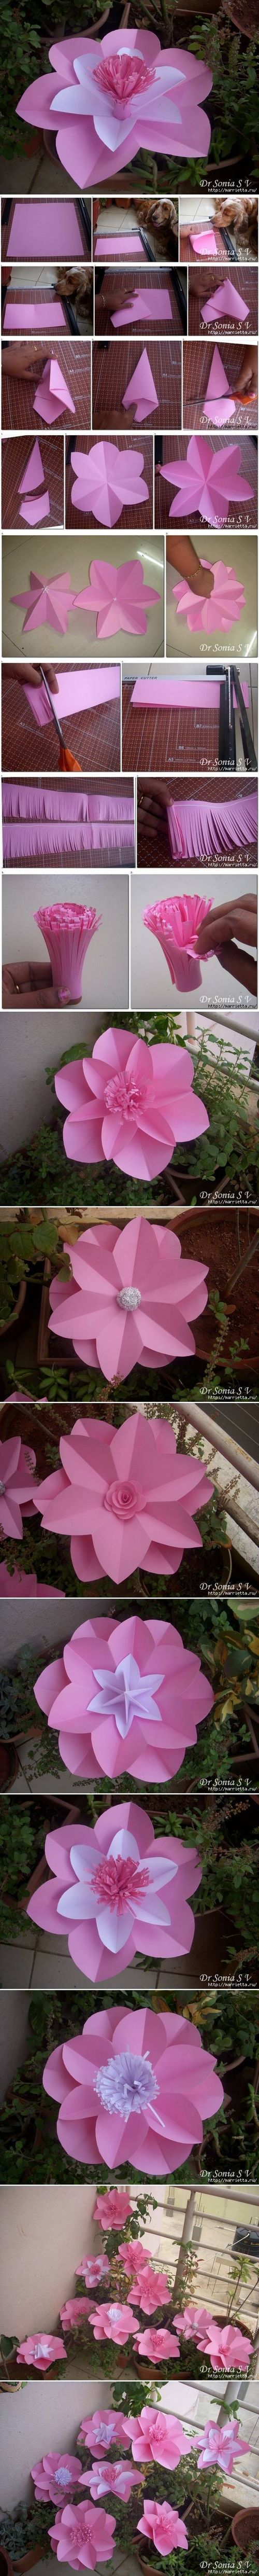 DIY Simple Beautiful Paper Flowers DIY Projects / UsefulDIY.com